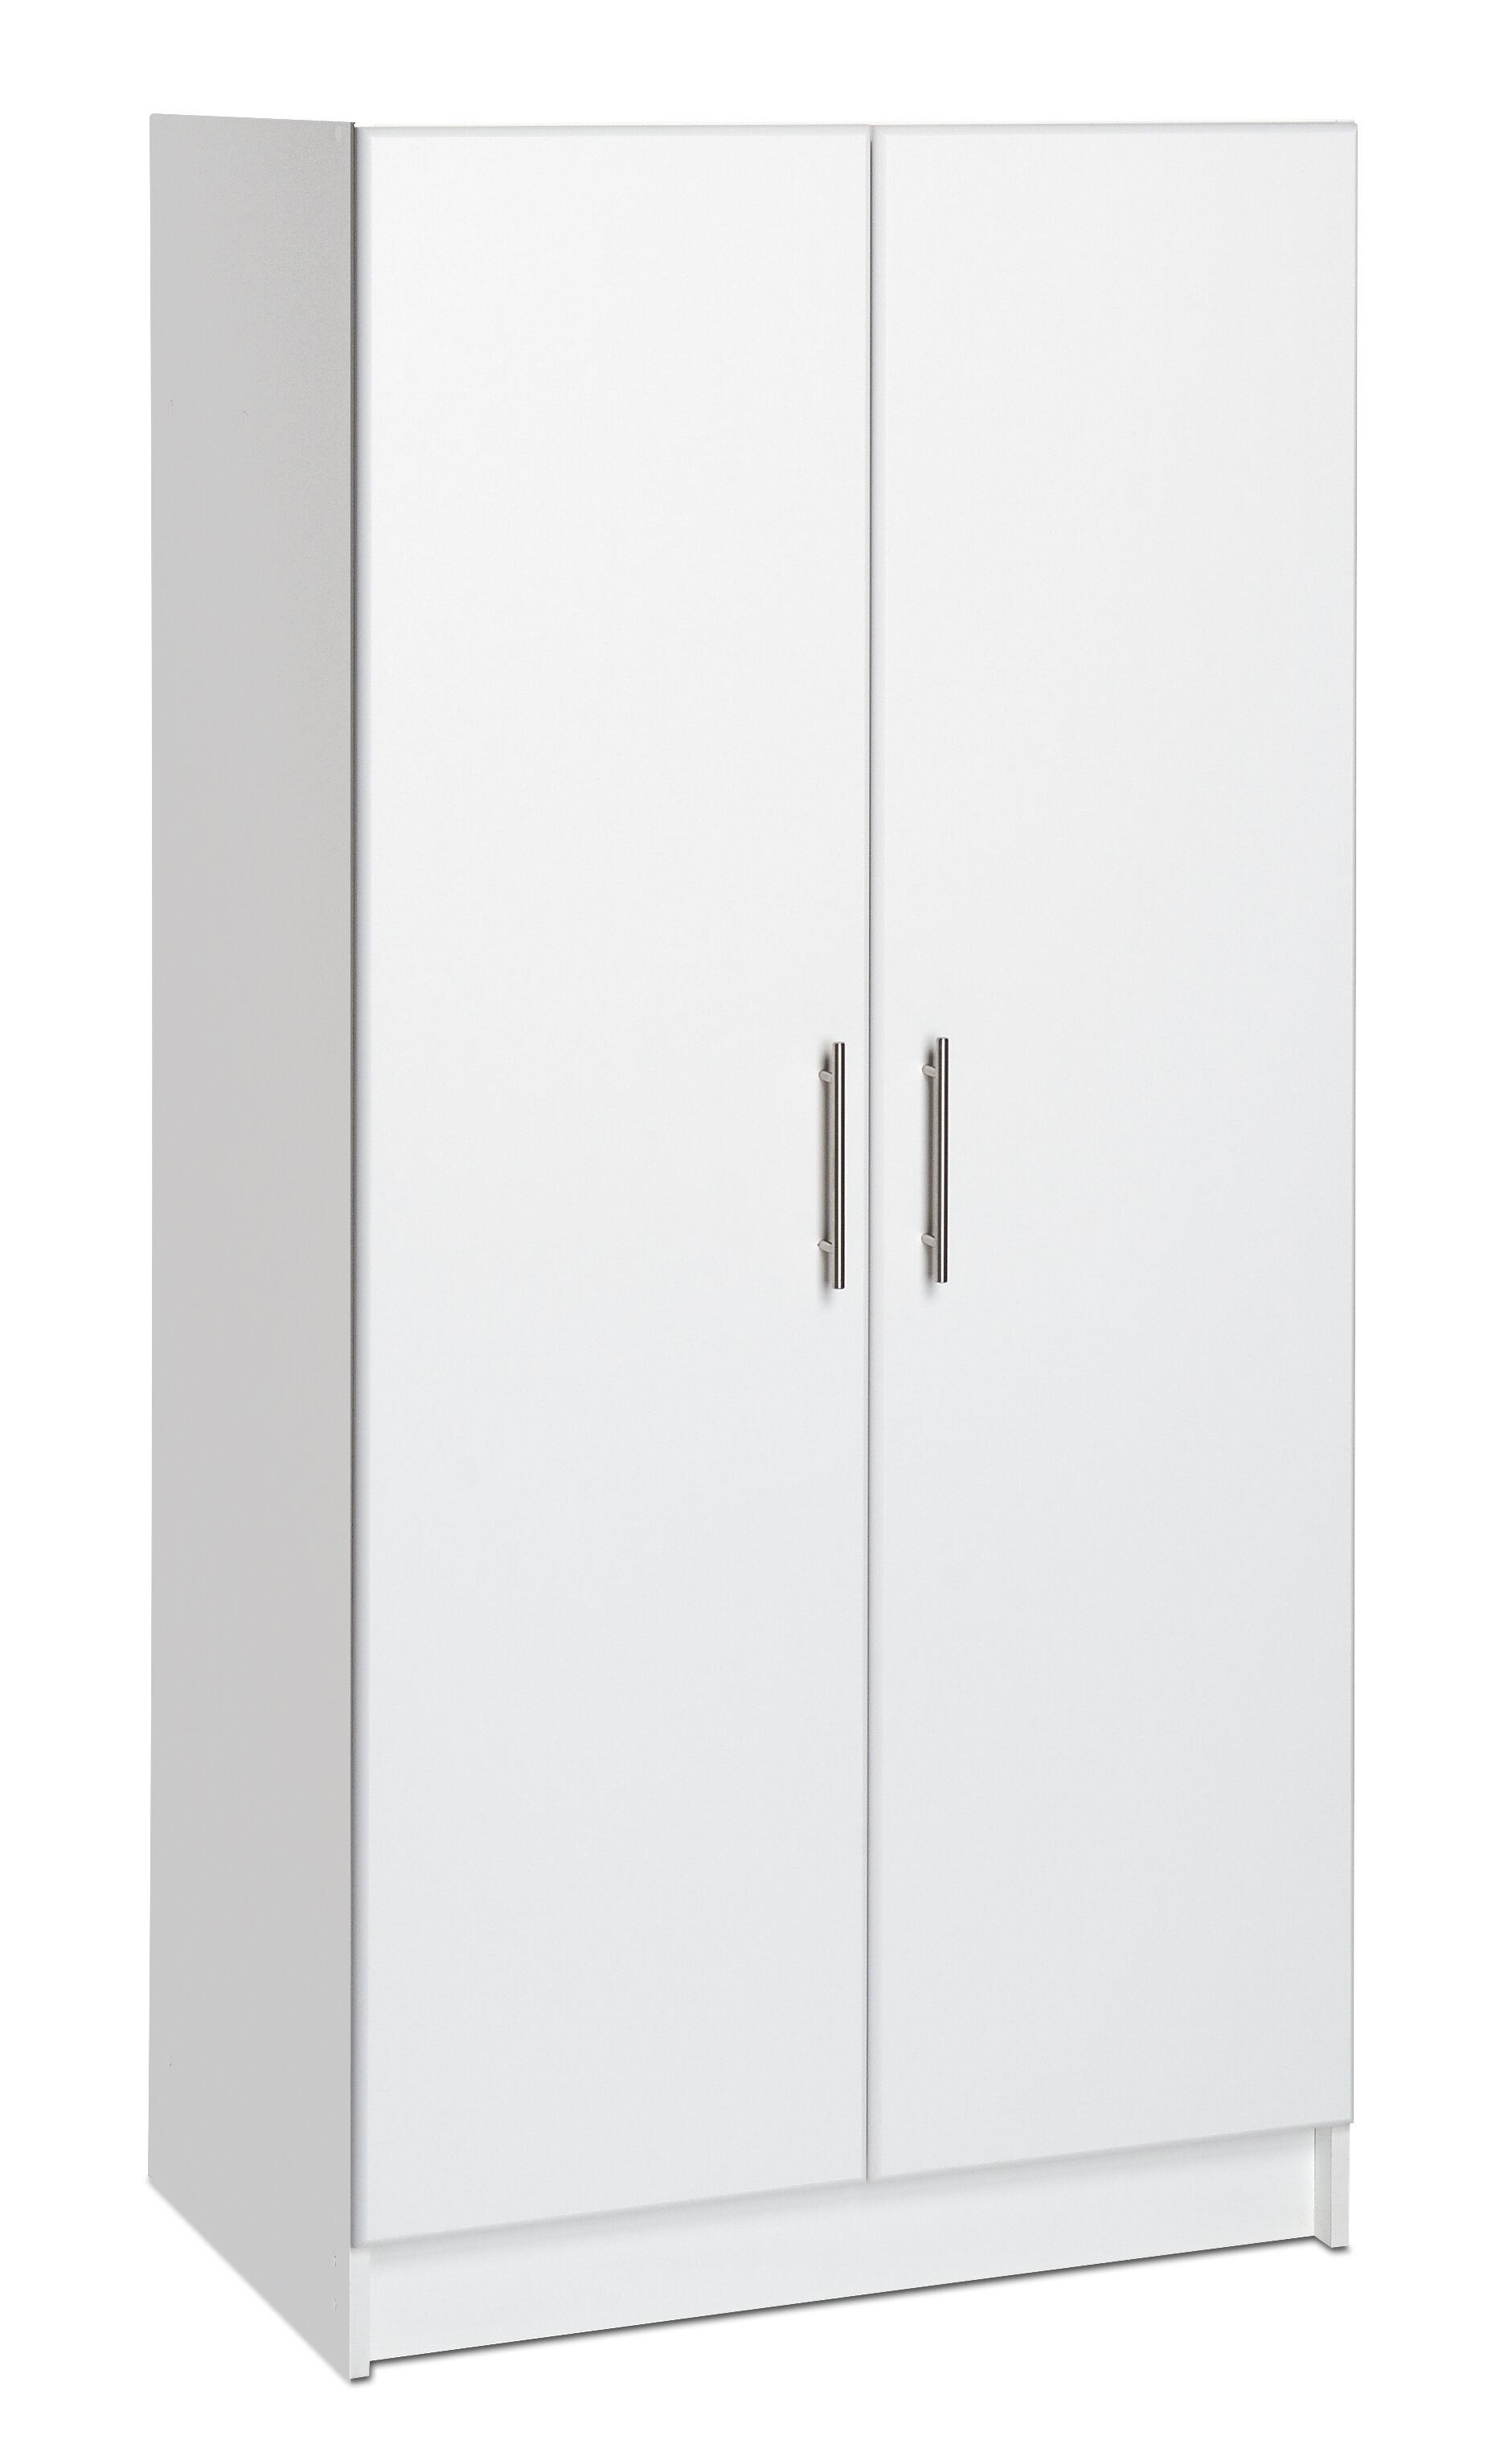 "Cape 5"" H x 5"" W x 5"" D Wardrobe Cabinet"